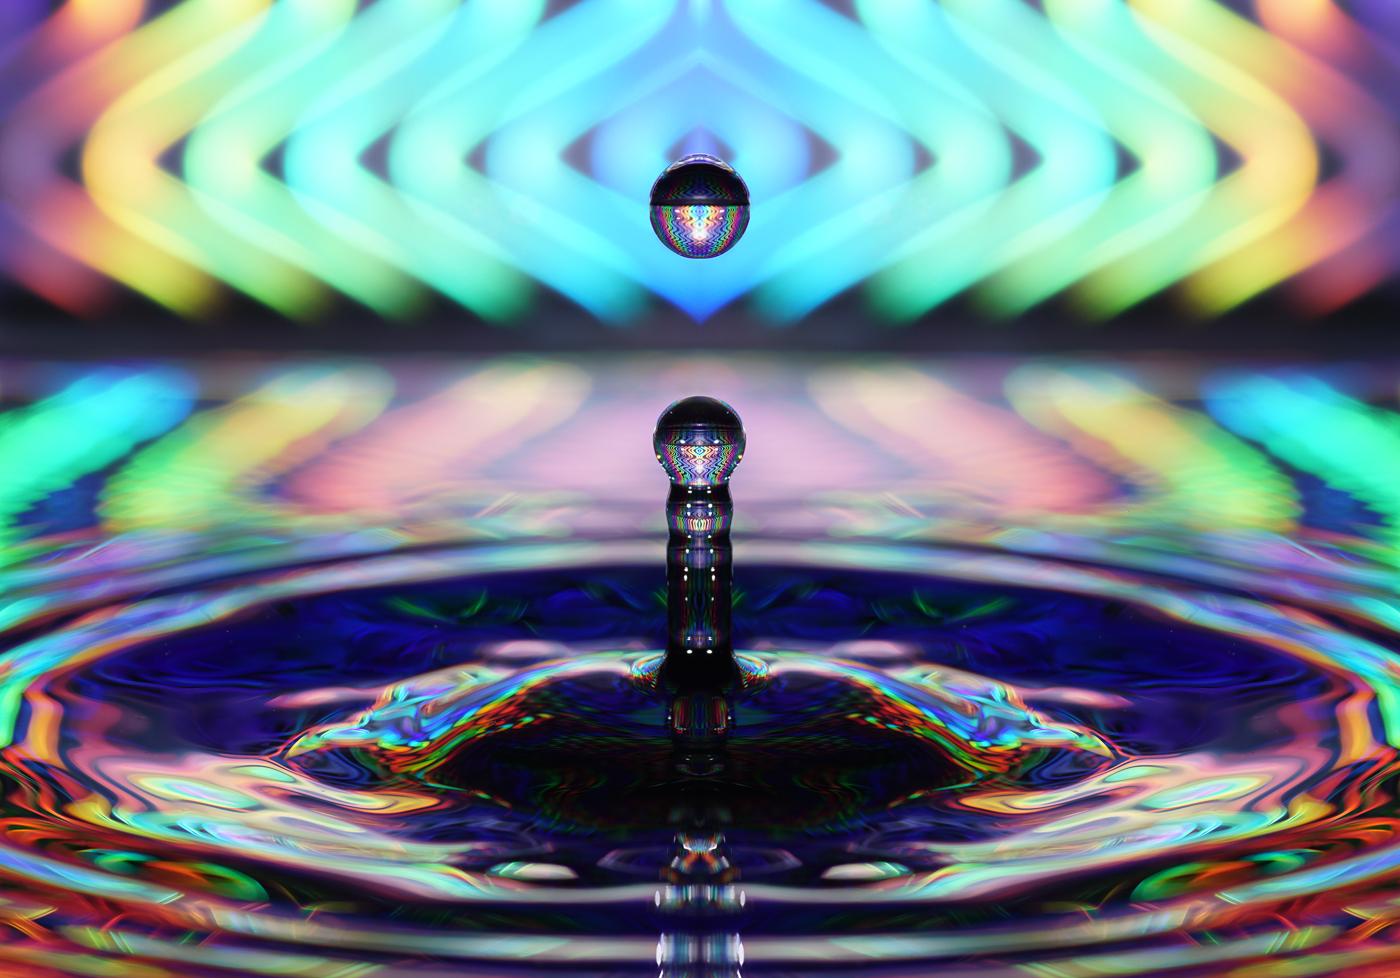 Mirror Mirror by endprocess83